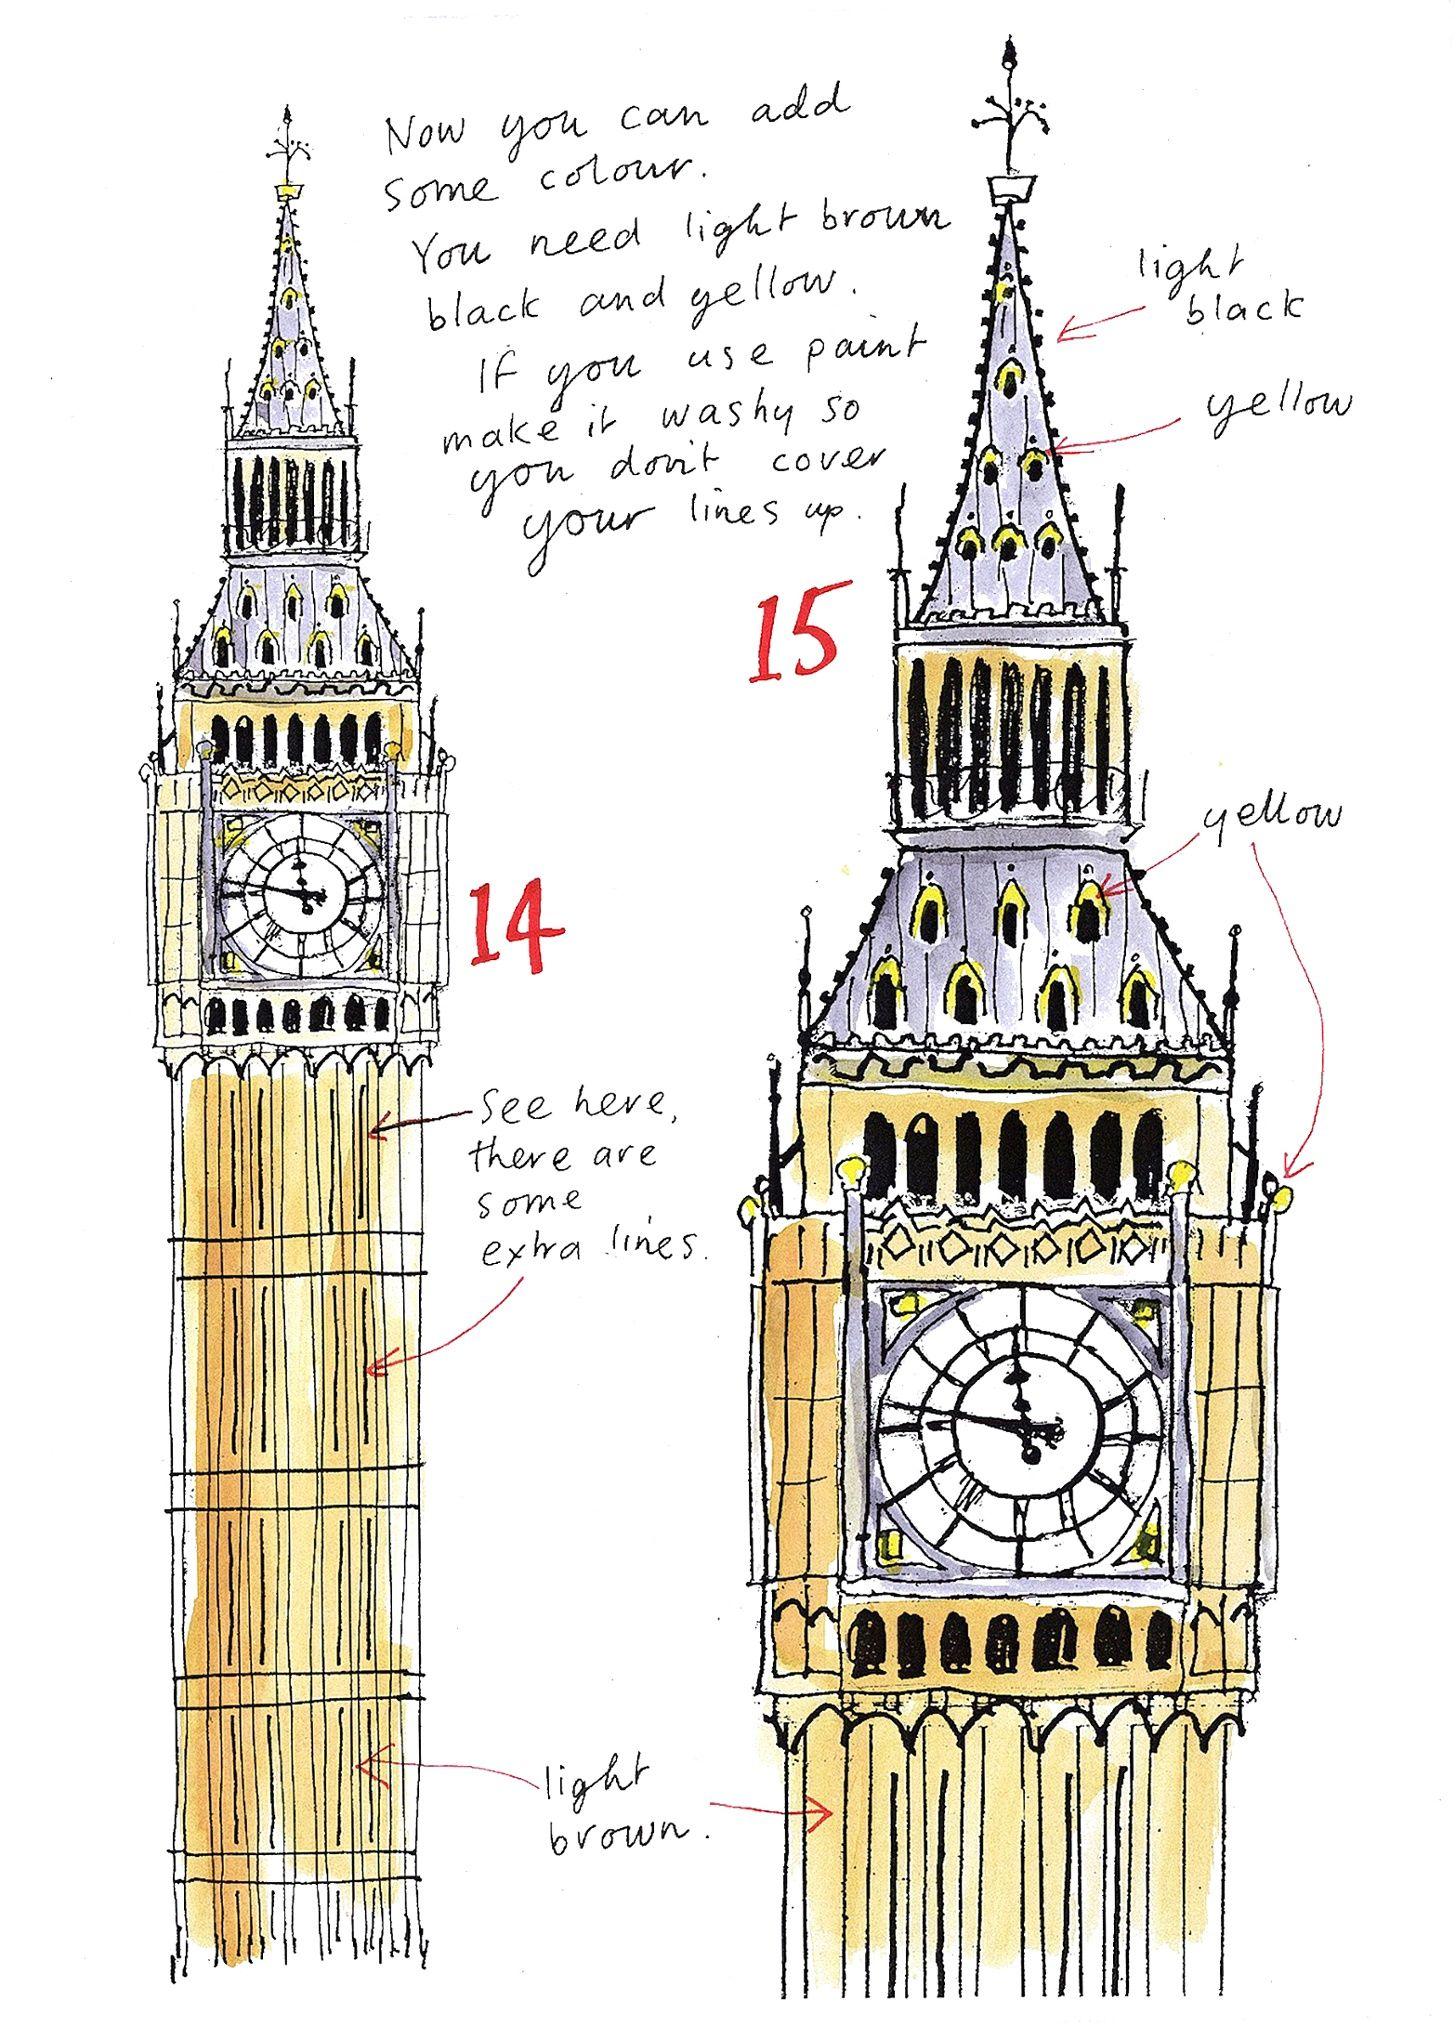 Drawing now big ben #1